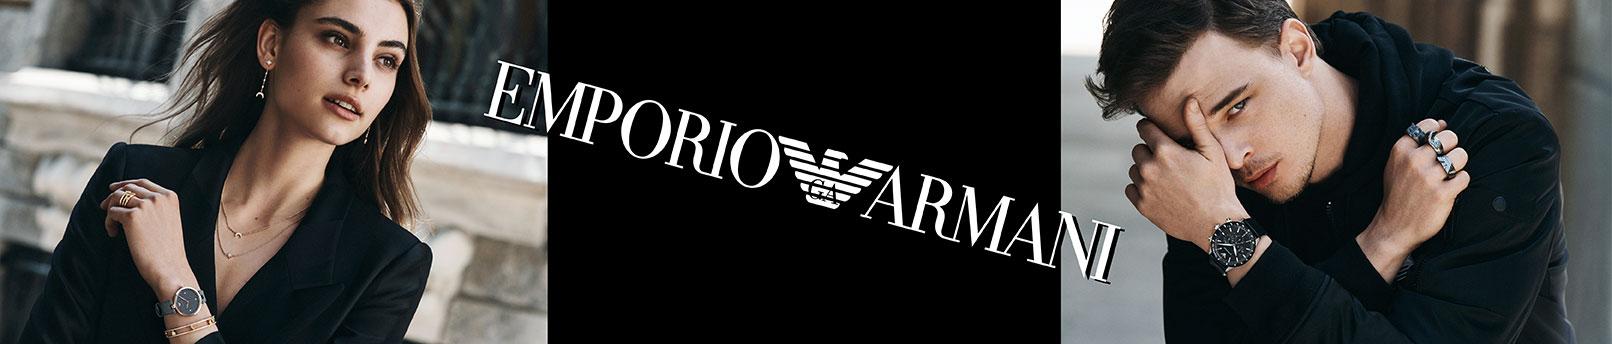 Odkryj Emporio Armani